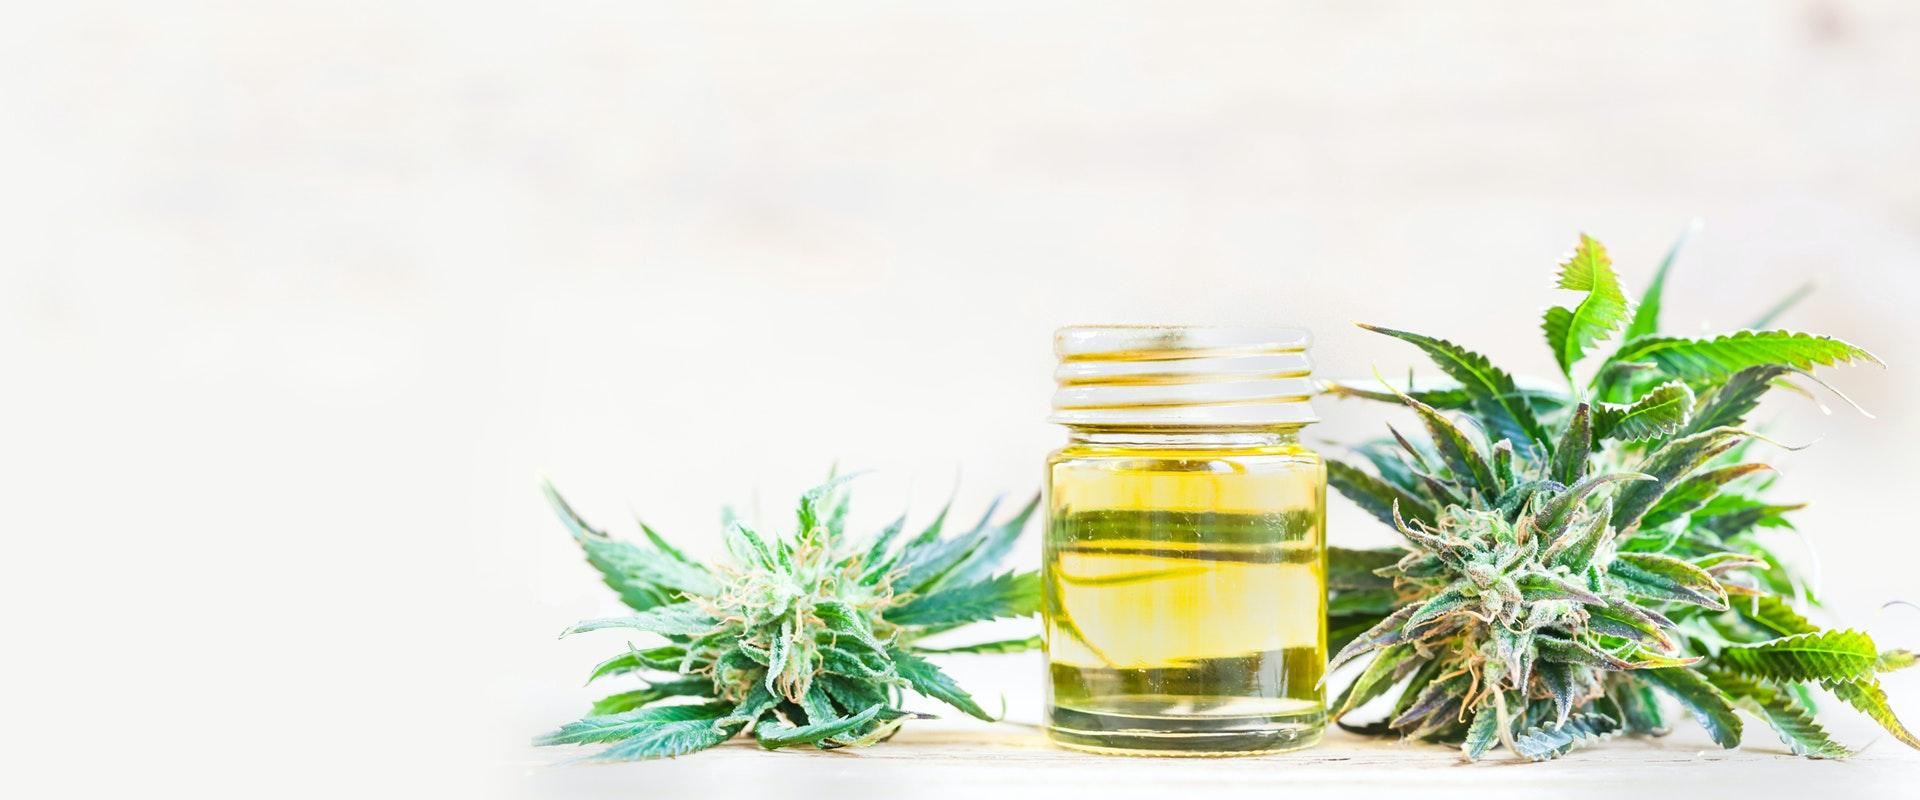 Marijuana buds laying next to a jar of CBD oil